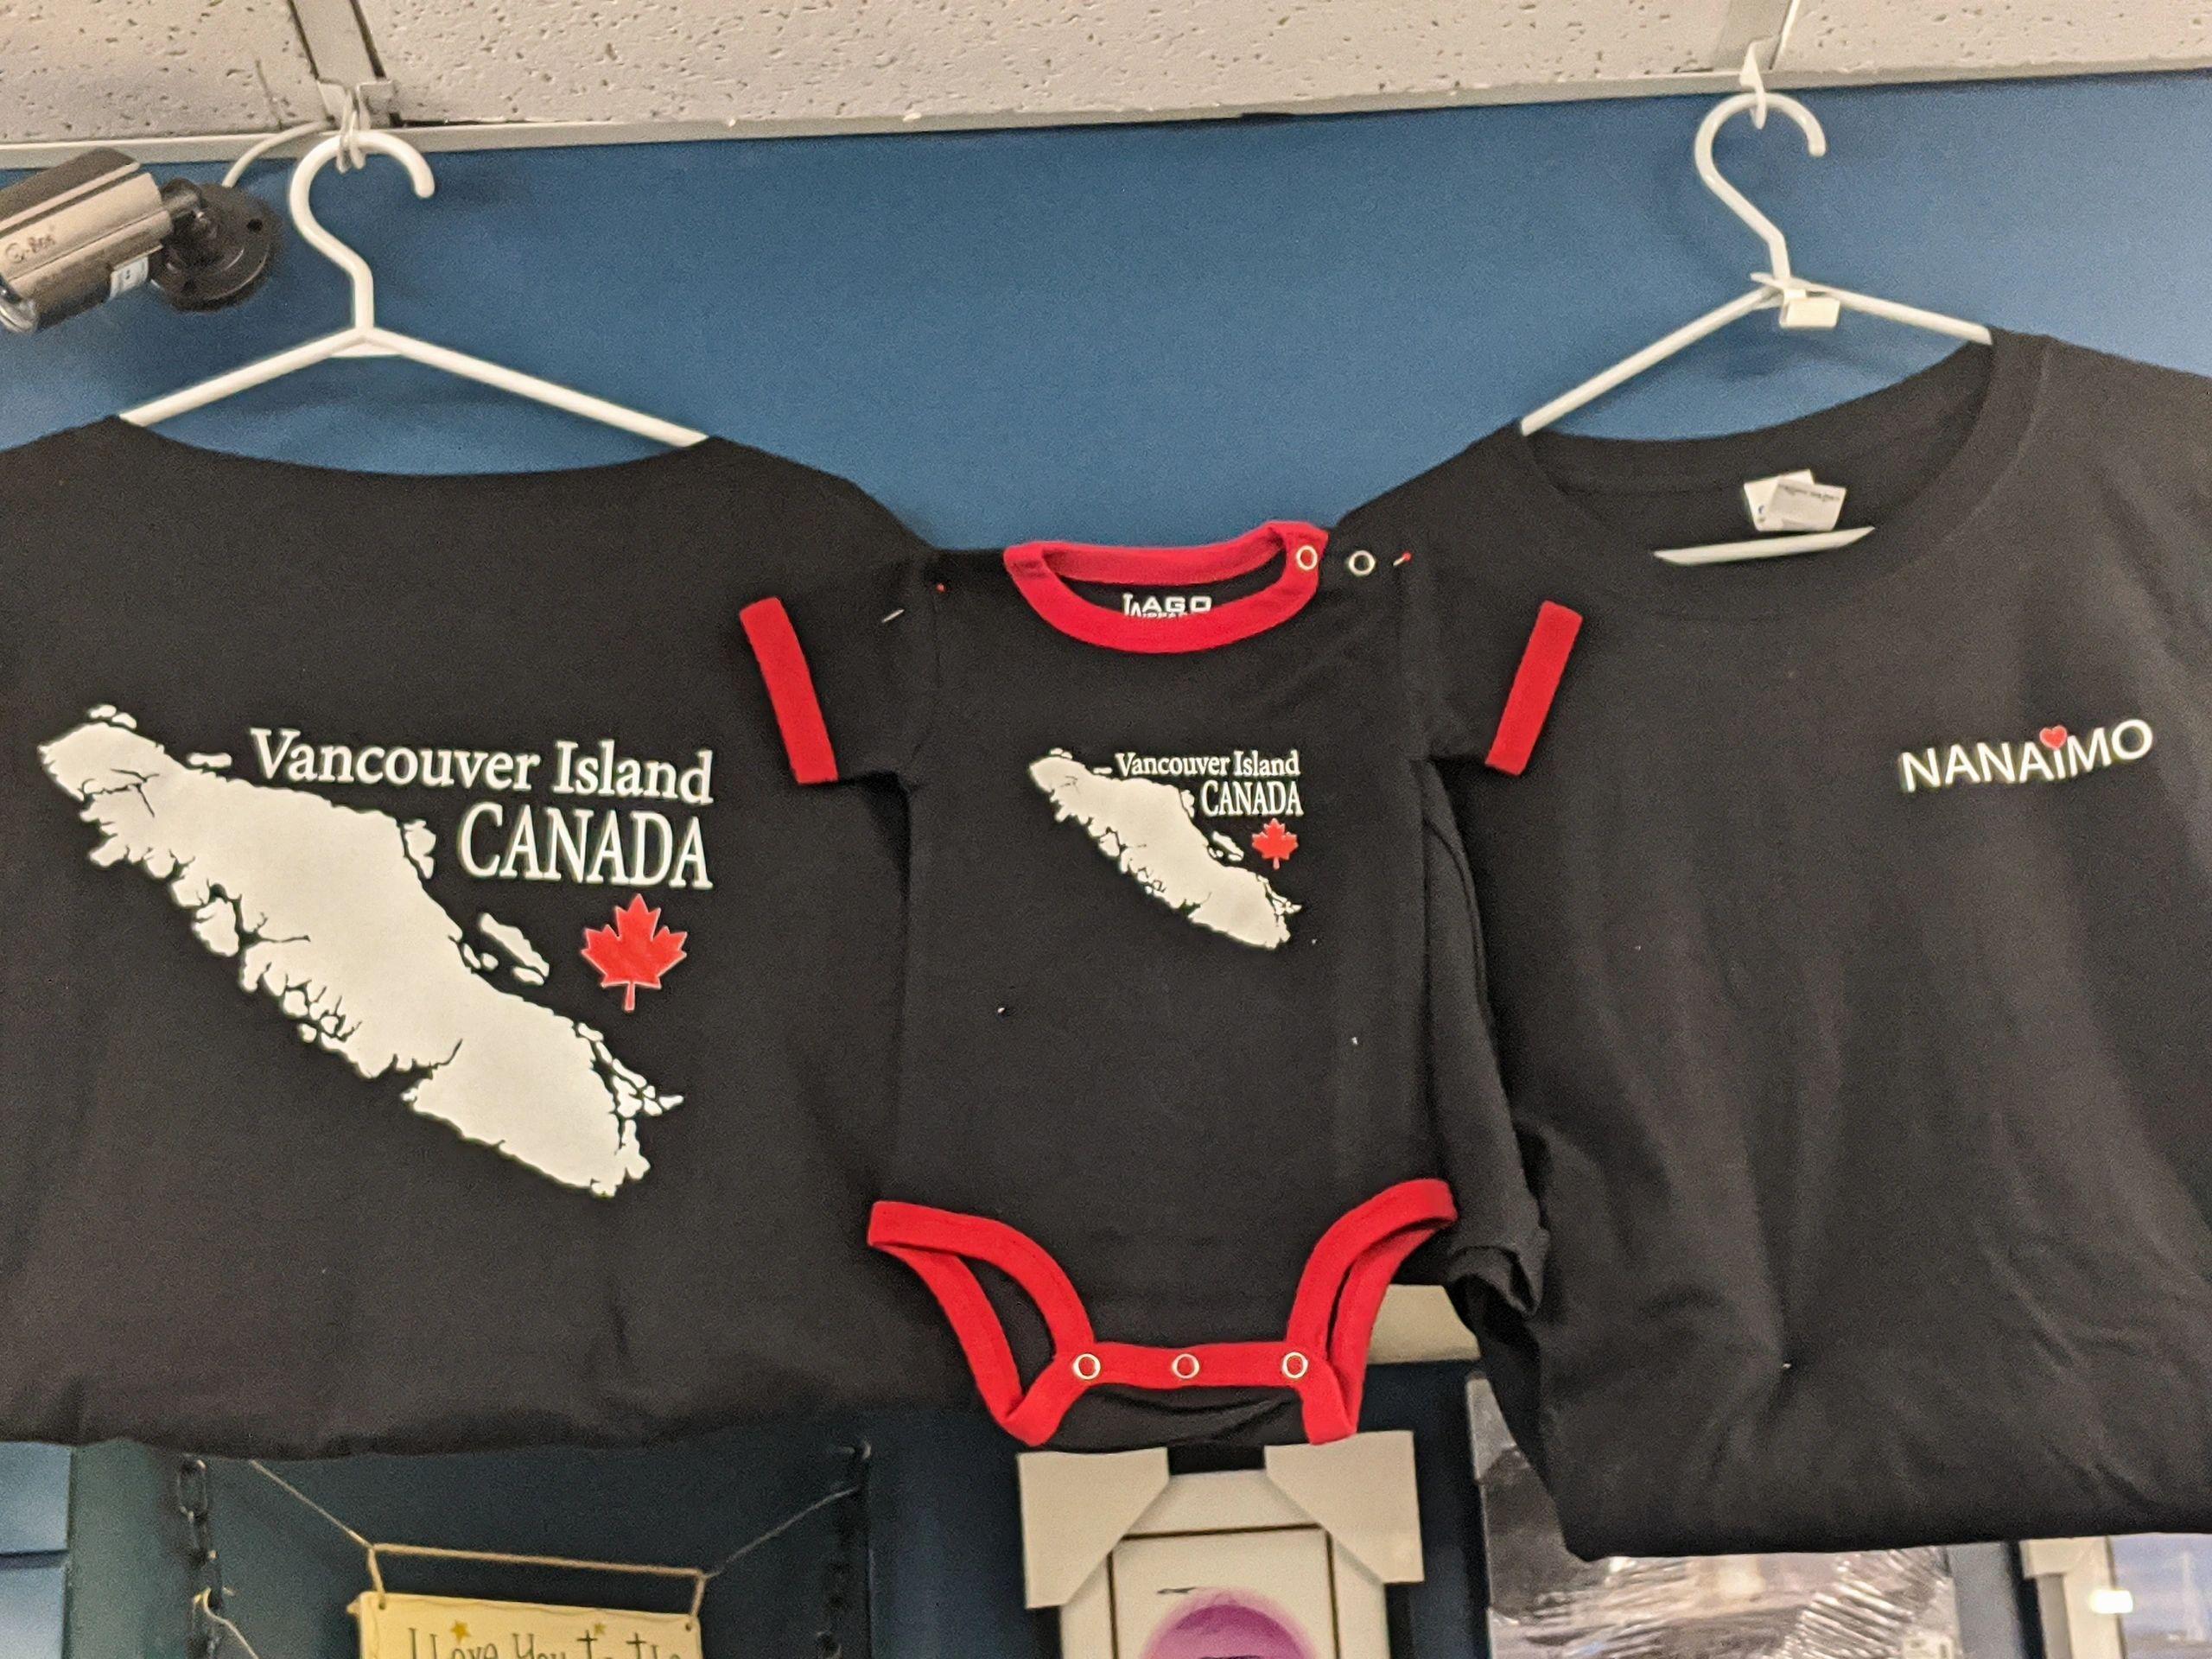 Newfoundland To Nanaimo logo